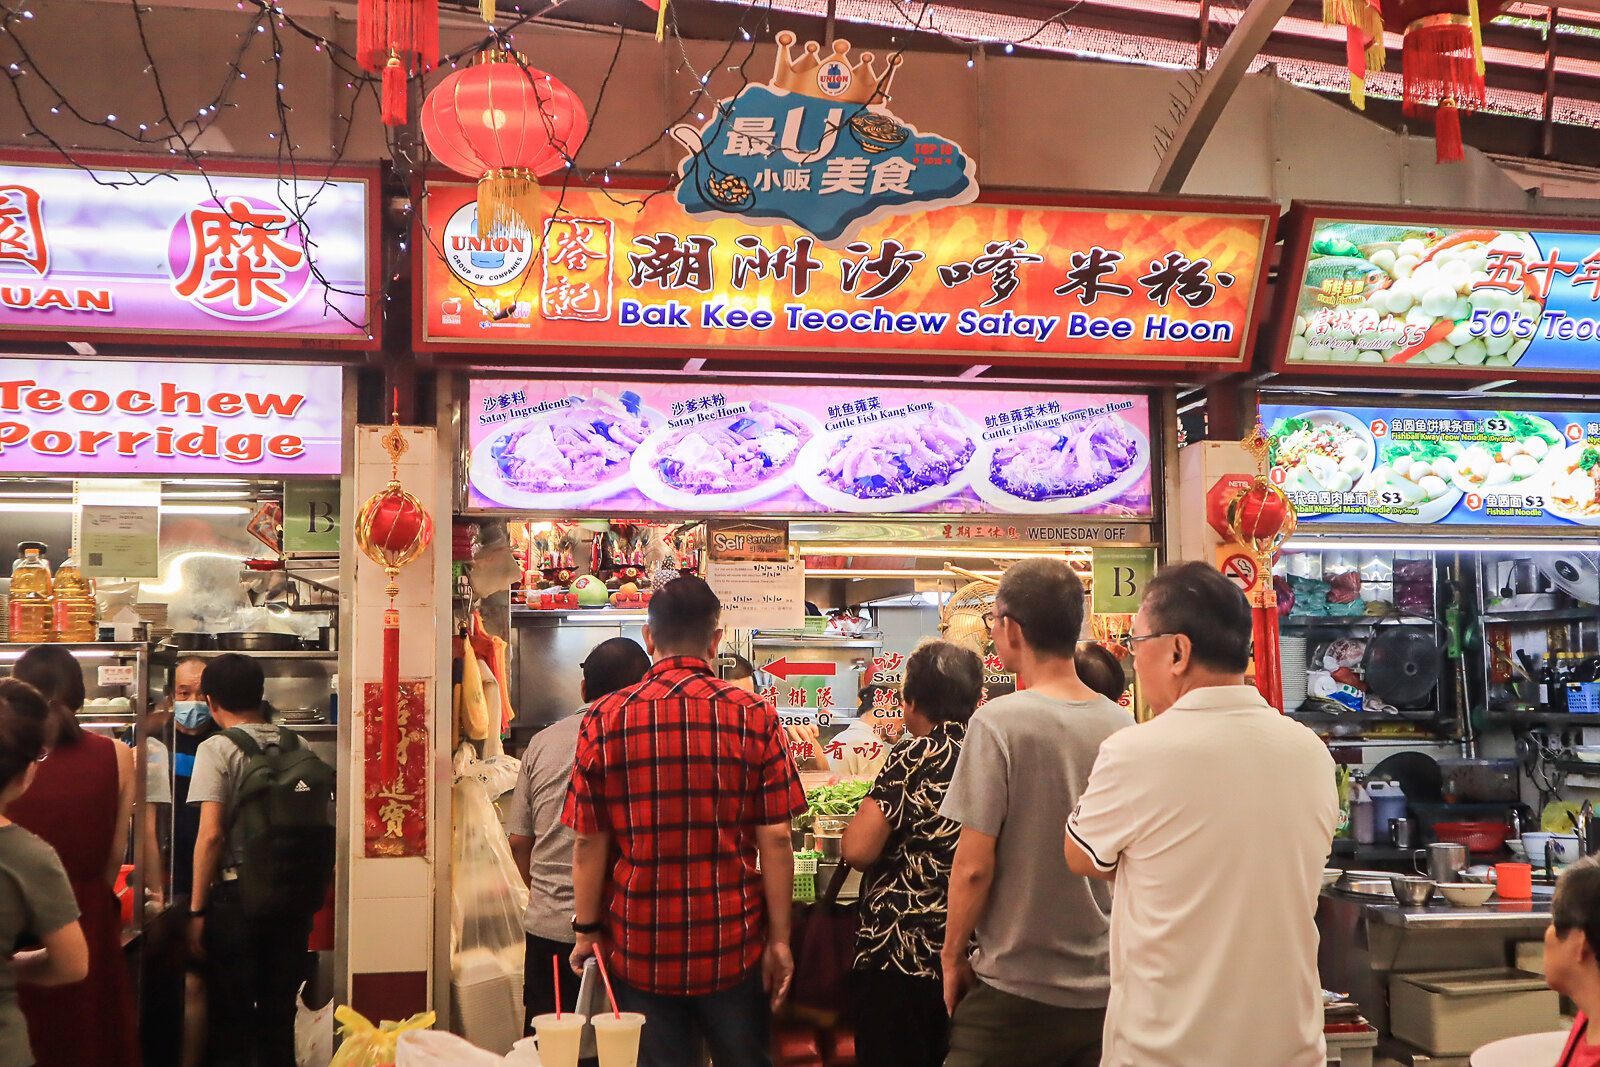 Bak Kee Teochew Satay Bee Hoon storefront 2